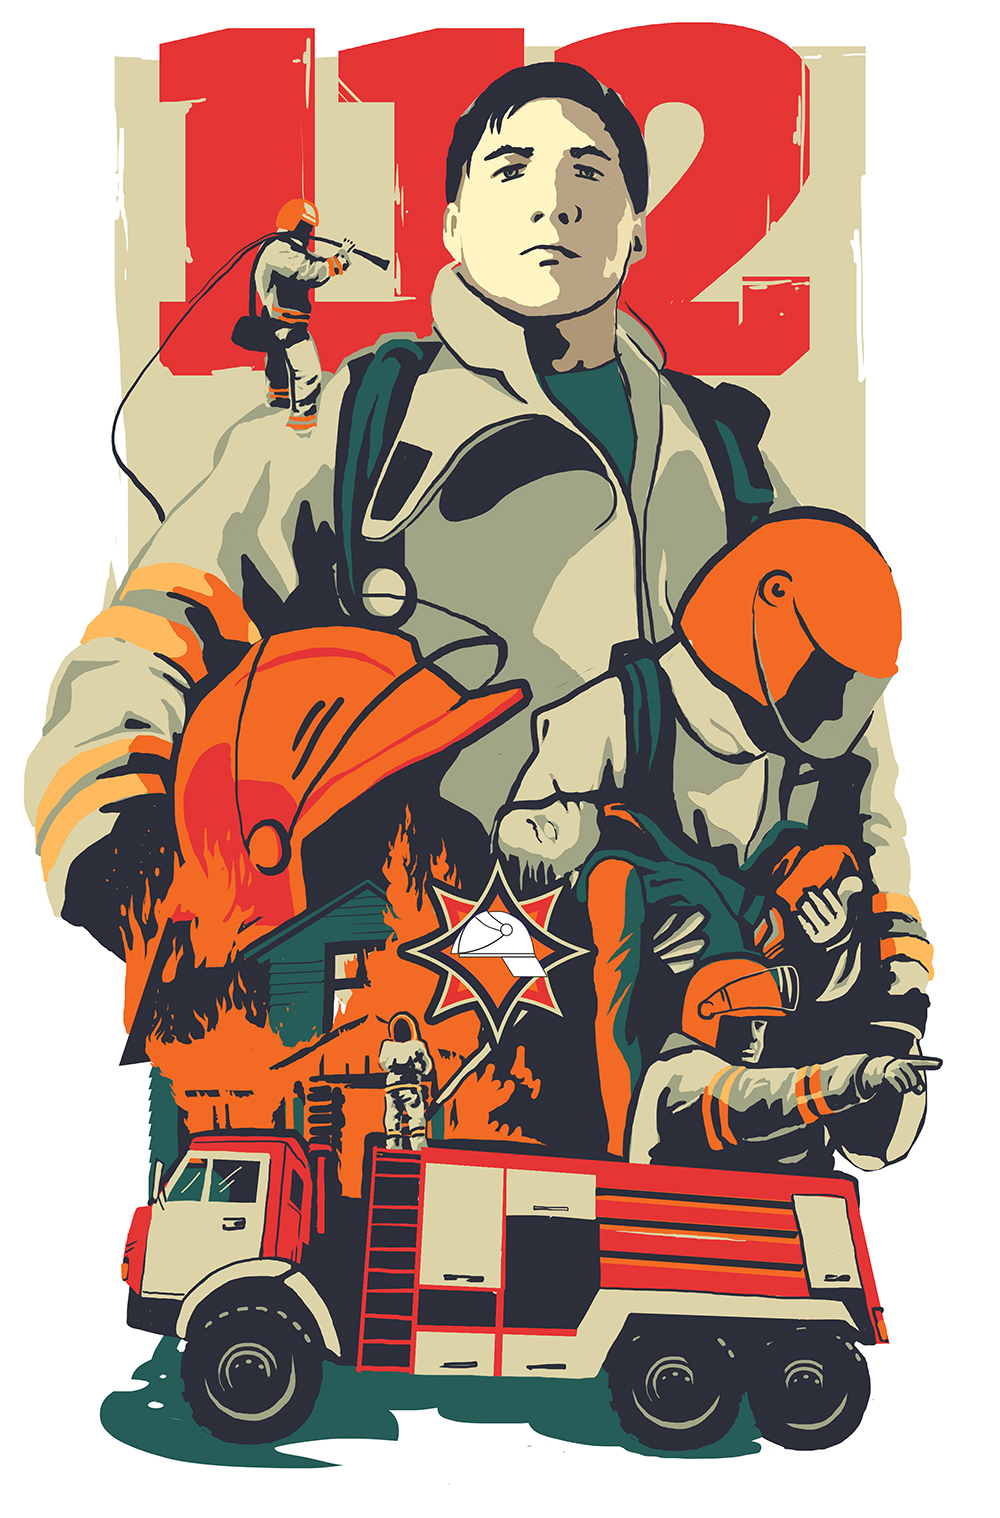 poster,ILLUSTRATION ,rescue,cotacotani,belarus,composition,МЧС,плакат,иллюстрация,fireman